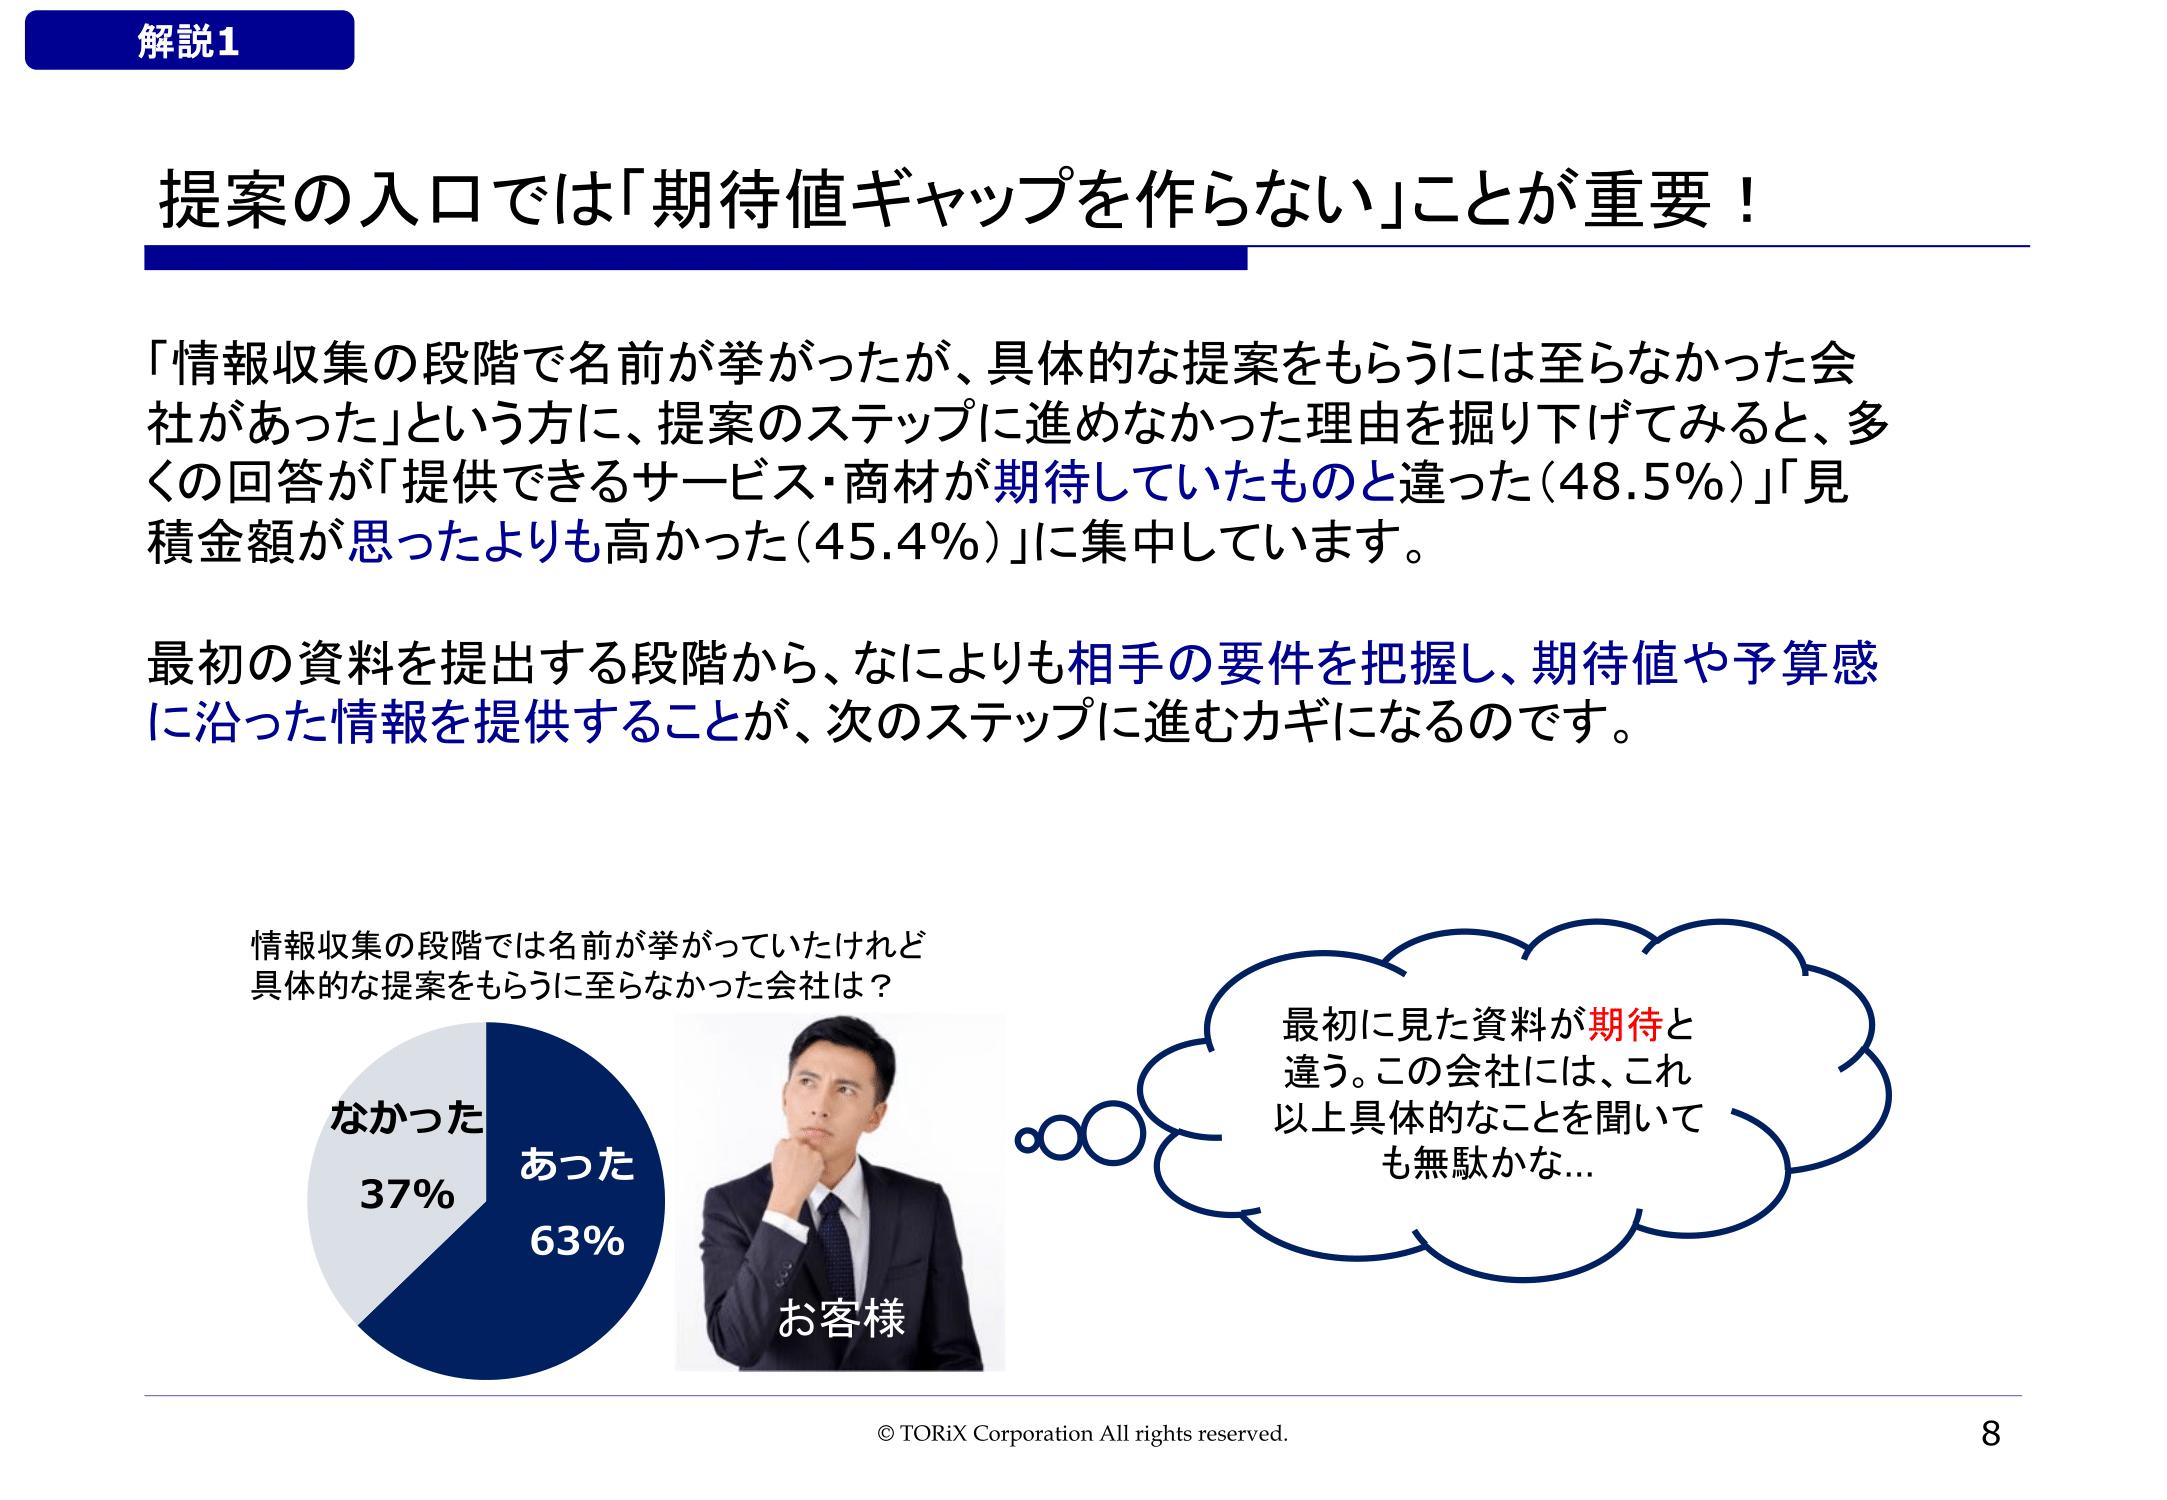 "180912_(TORiX)""選ばれ続ける営業""に関する調査レポート-08.png"